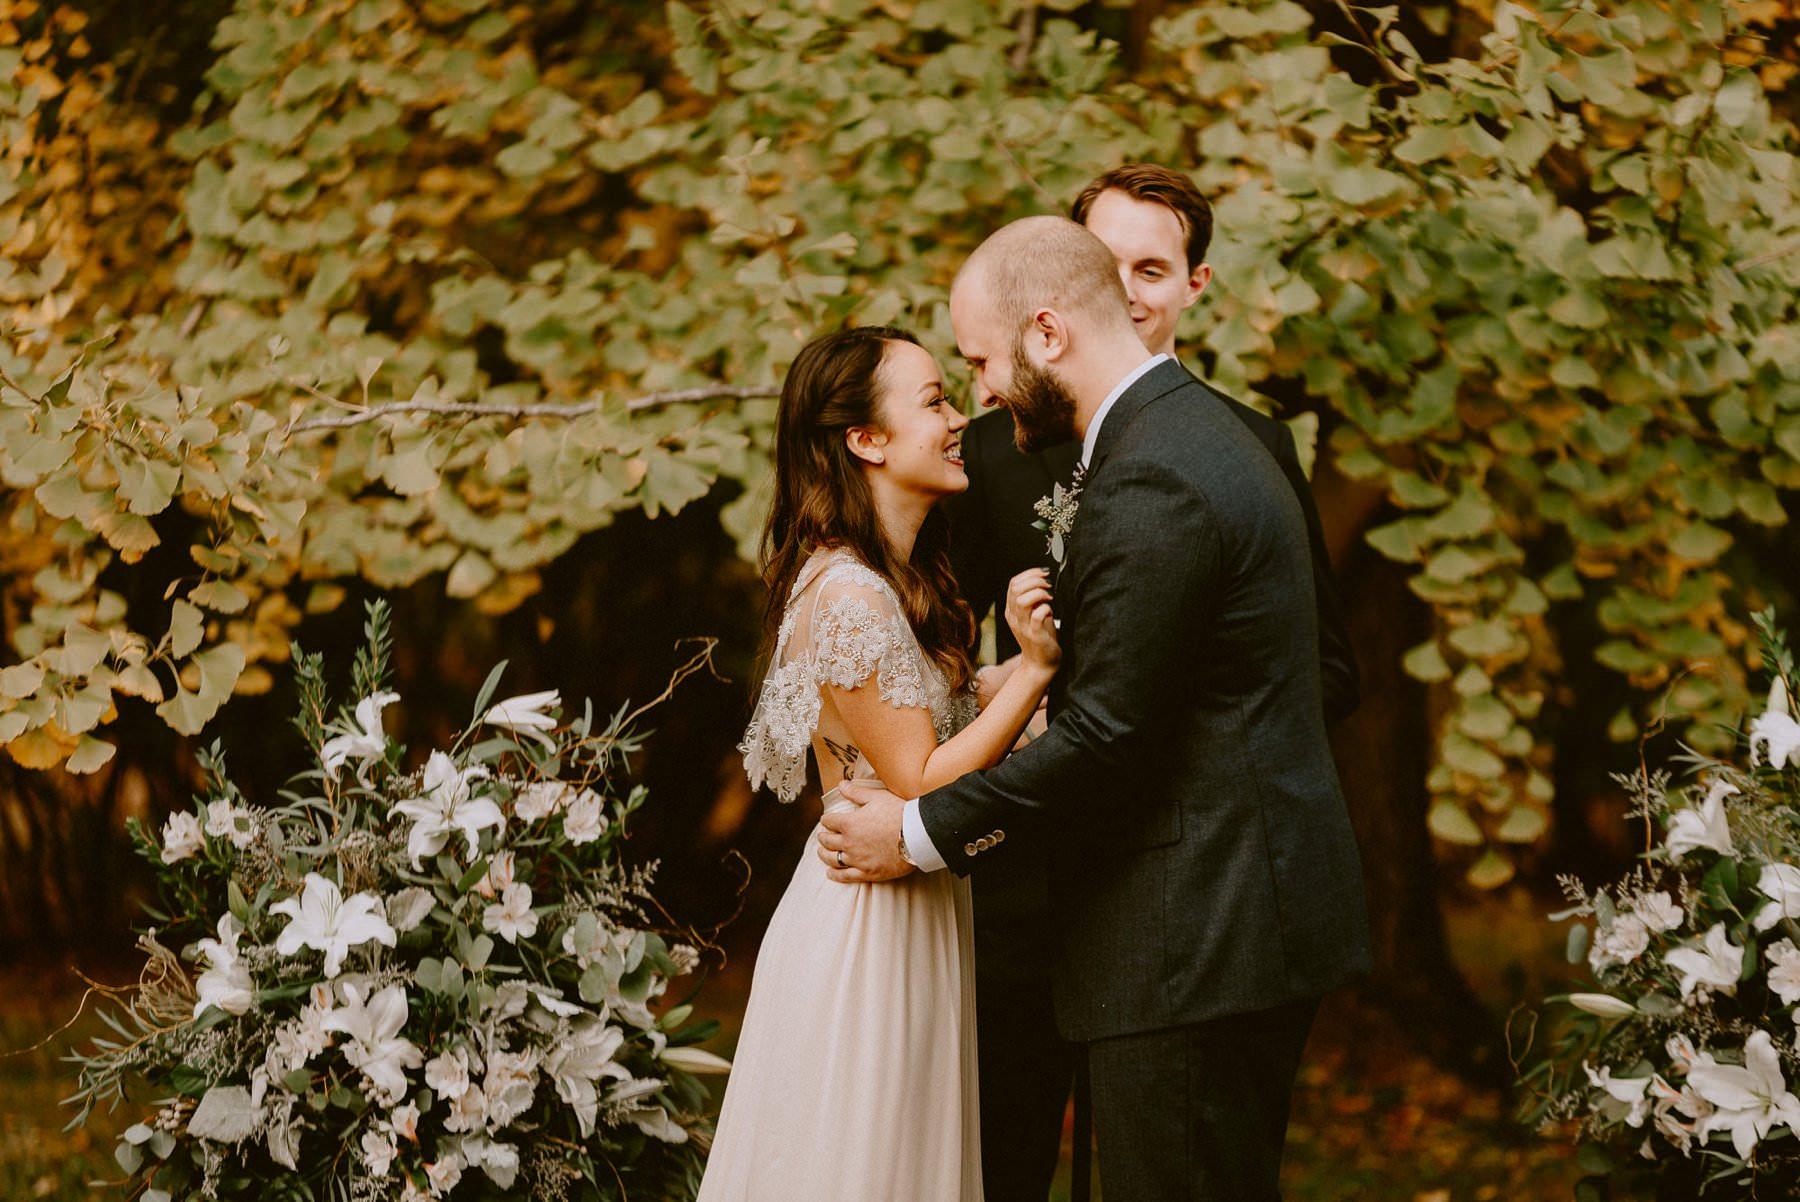 Tyler_arboretum_wedding-061.jpg